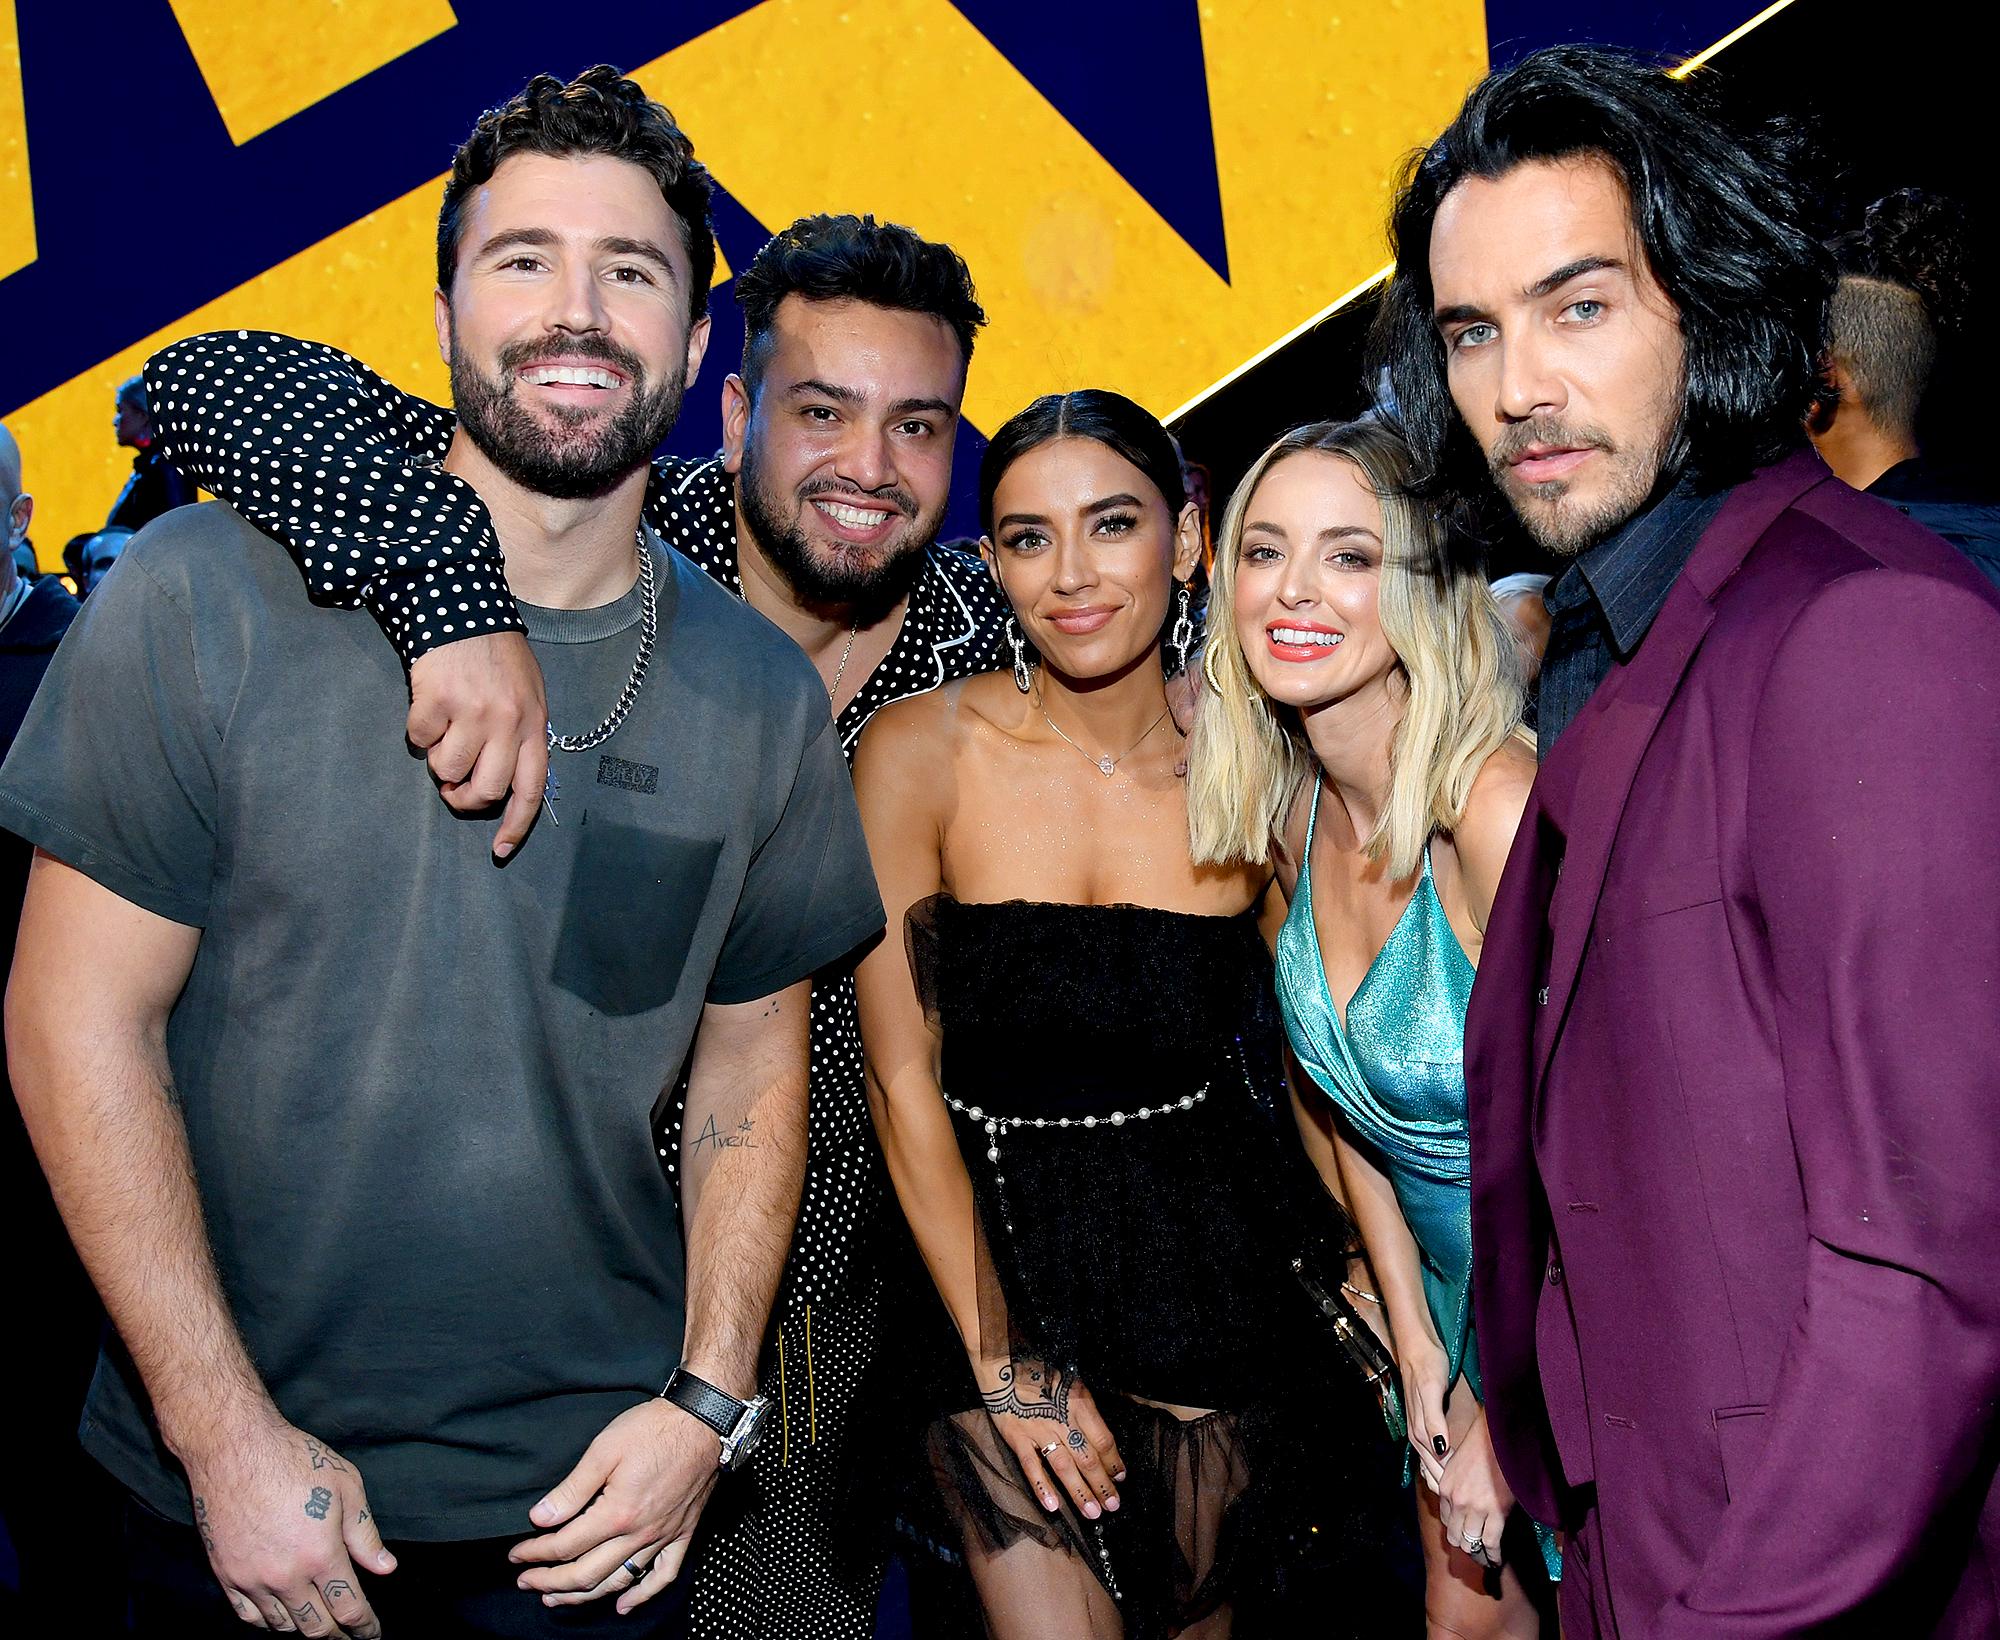 Brody-Jenner,-Frankie-Delgado,-Jen-Delgado,-Kaitlynn-Carter-Jenner,-and-Justin-Bobby-Brescia-MTV-Movie-TV-Awards